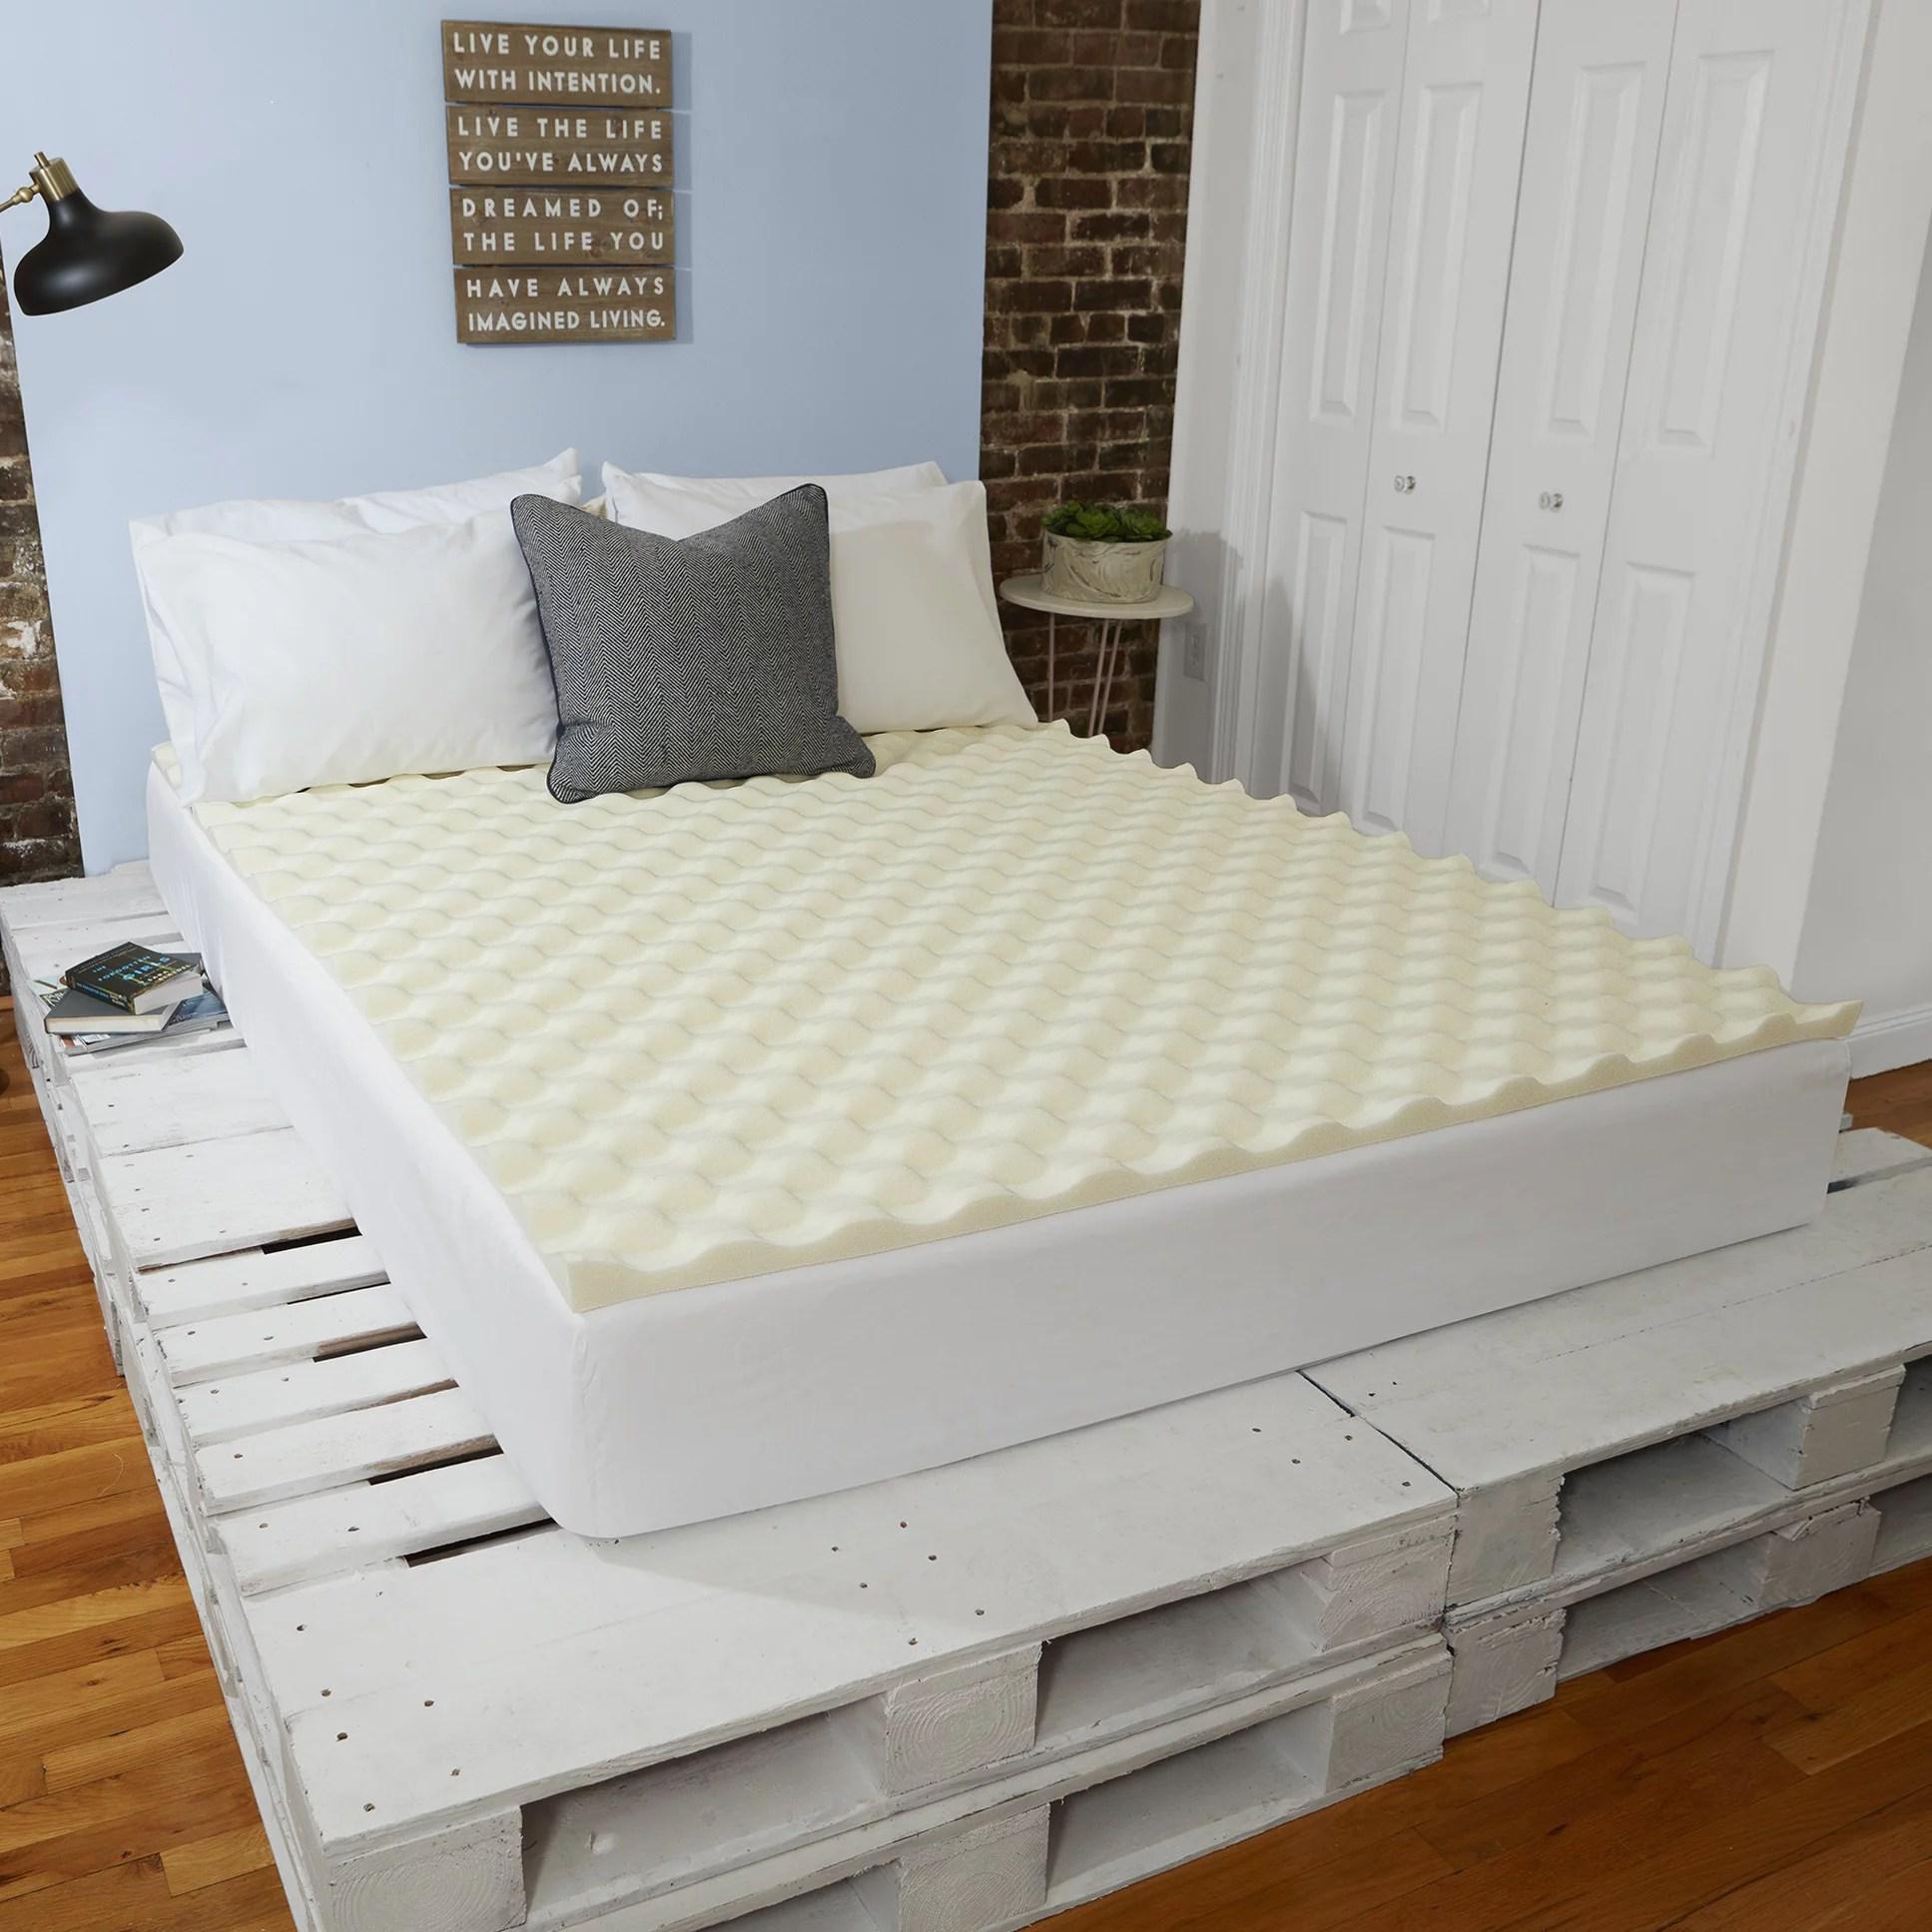 http www gulmed in pic aspx cid 852 shop my pillow topper walmart xi 4 xc 22 pr 29 99 you 0